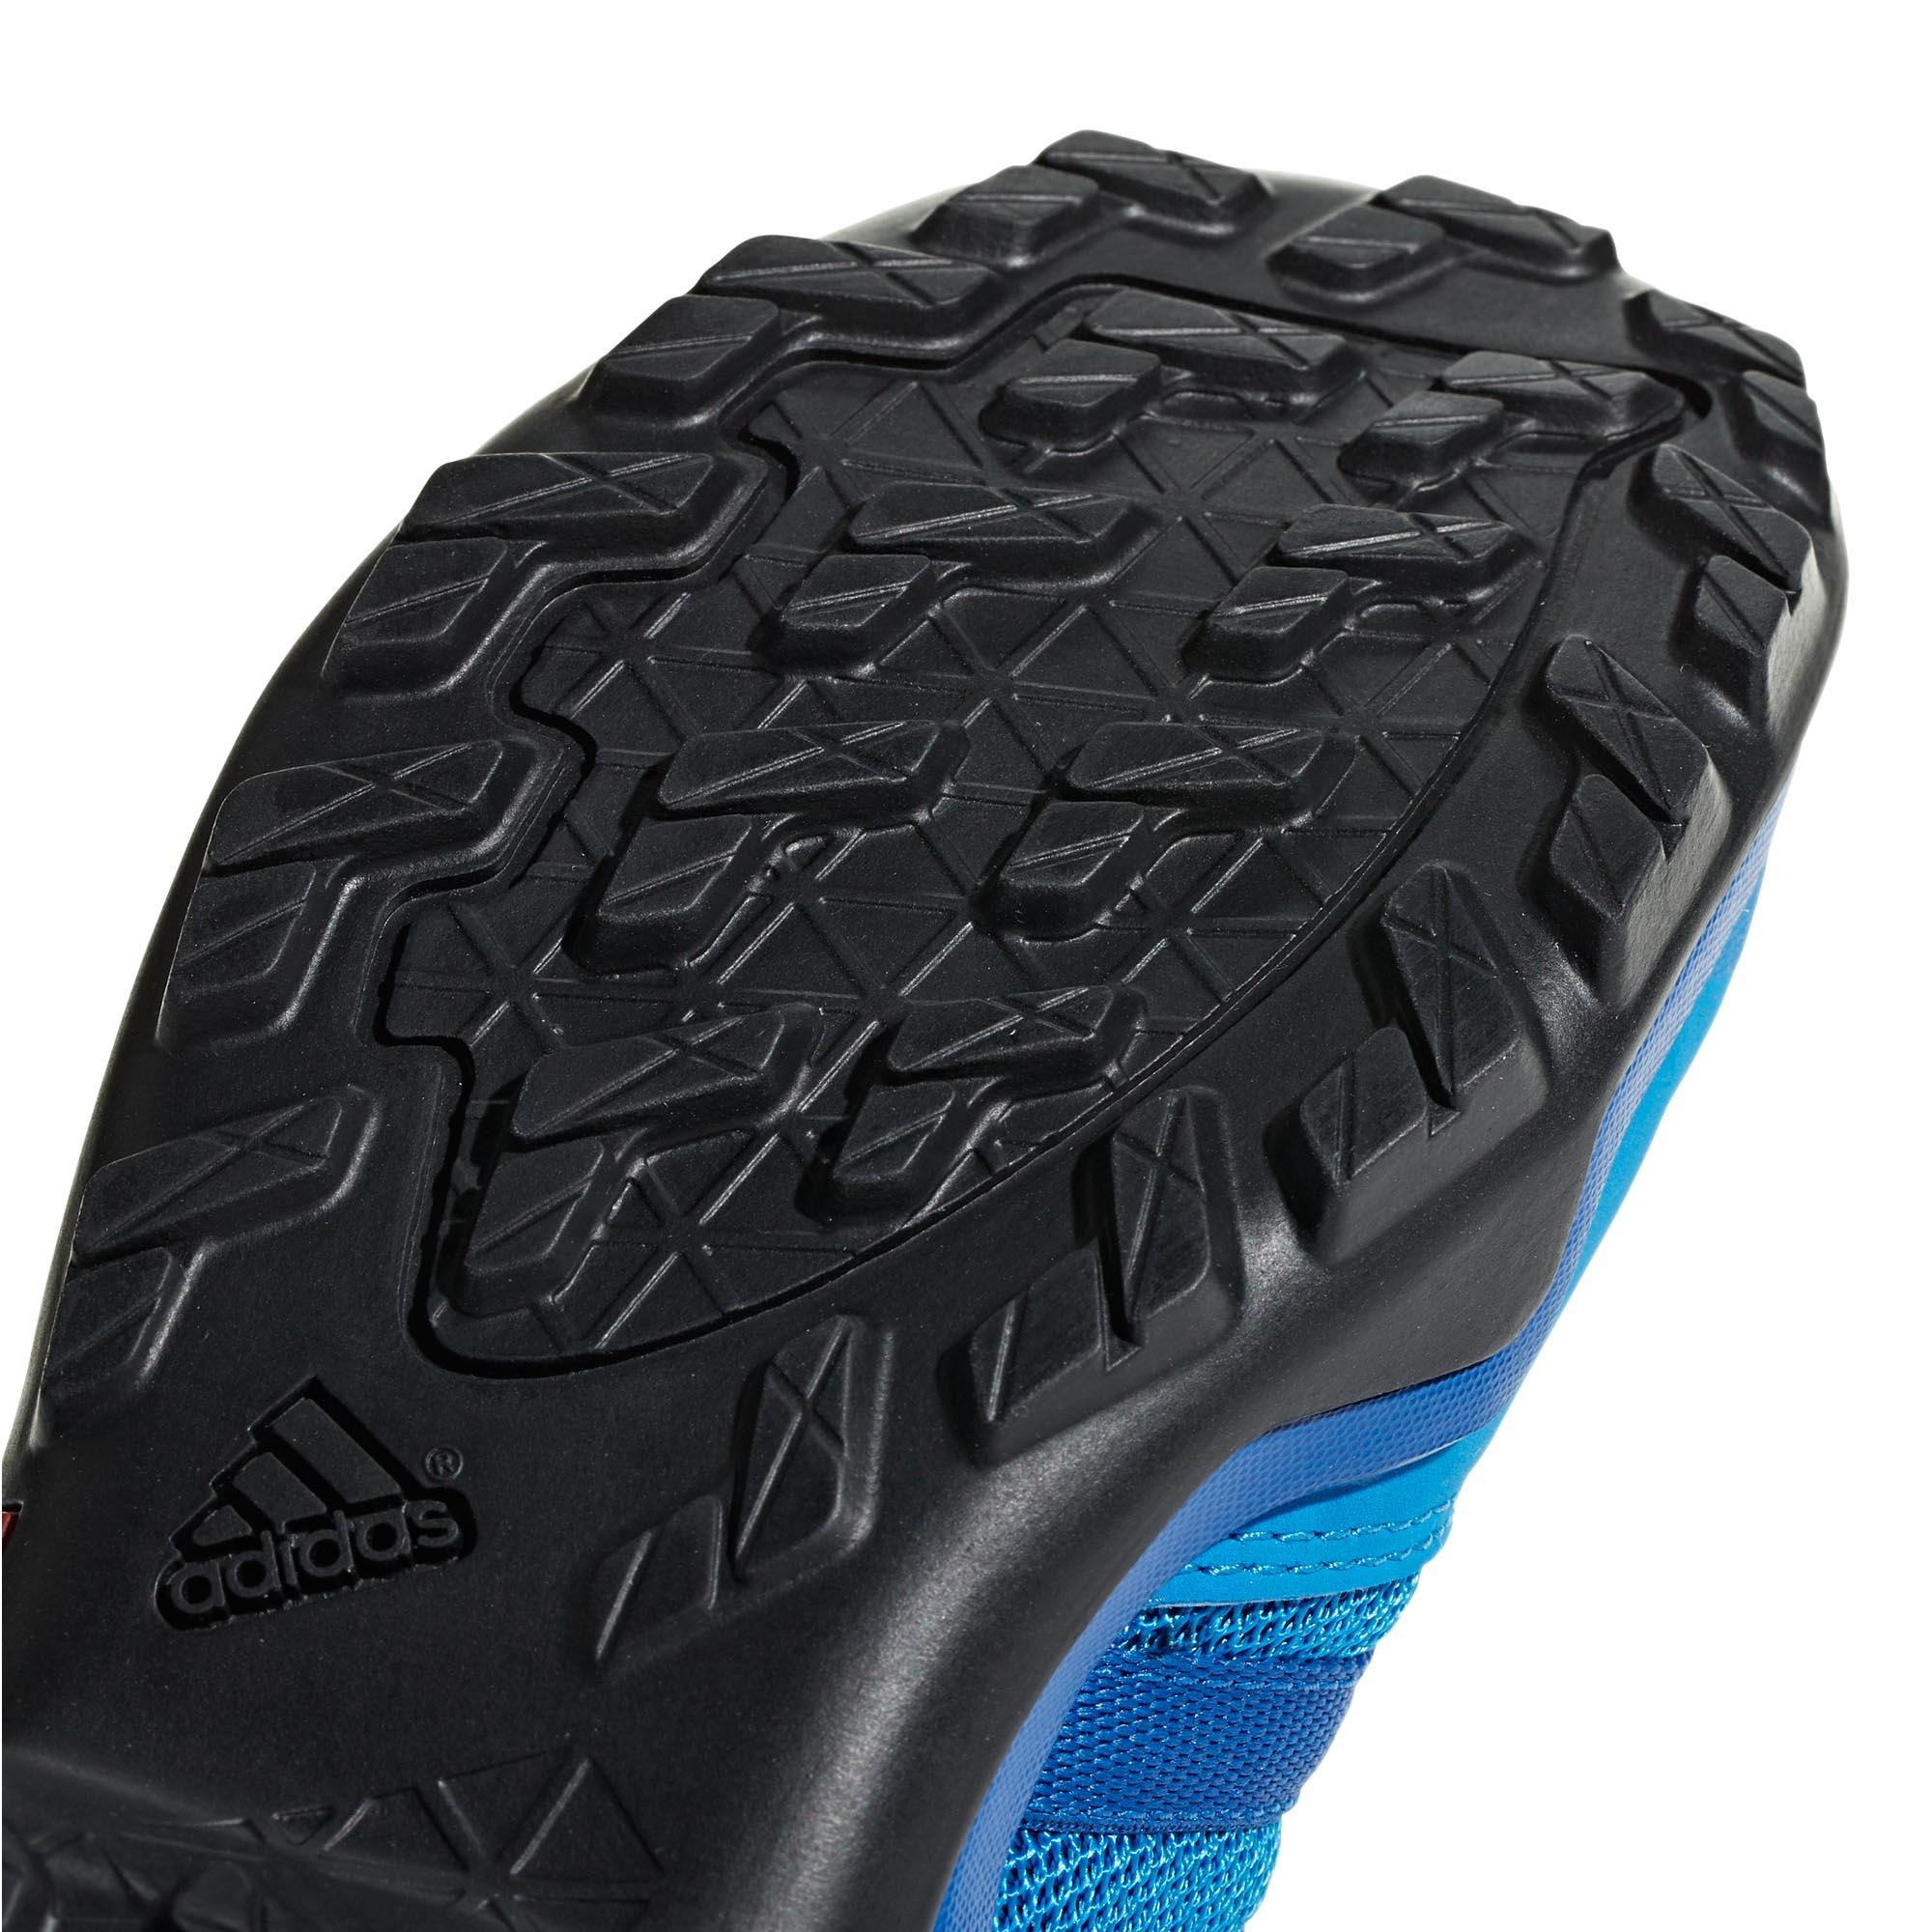 adidas-Terrex-AX2R-Kids-Boys-Trail-Hiking-Trainer-Shoe-Blue-Black thumbnail 10